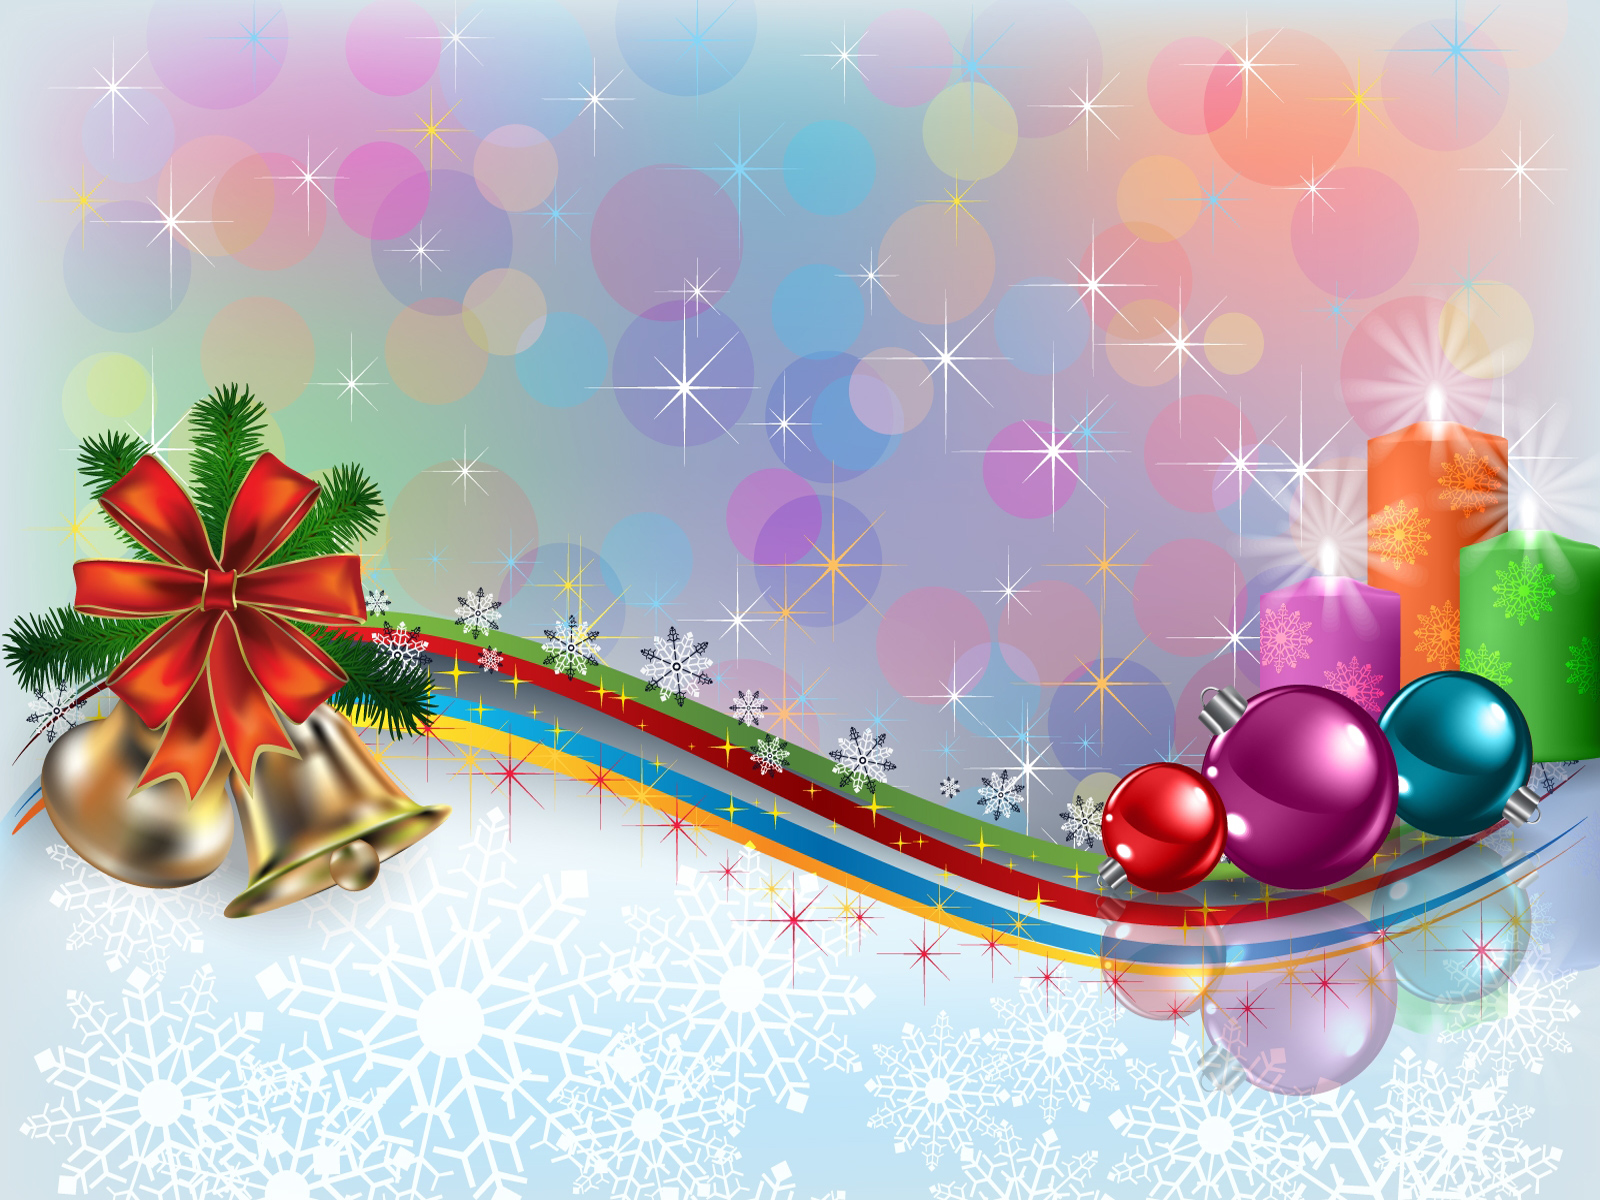 47] Christmas Wallpapers for Laptops on WallpaperSafari 1600x1200